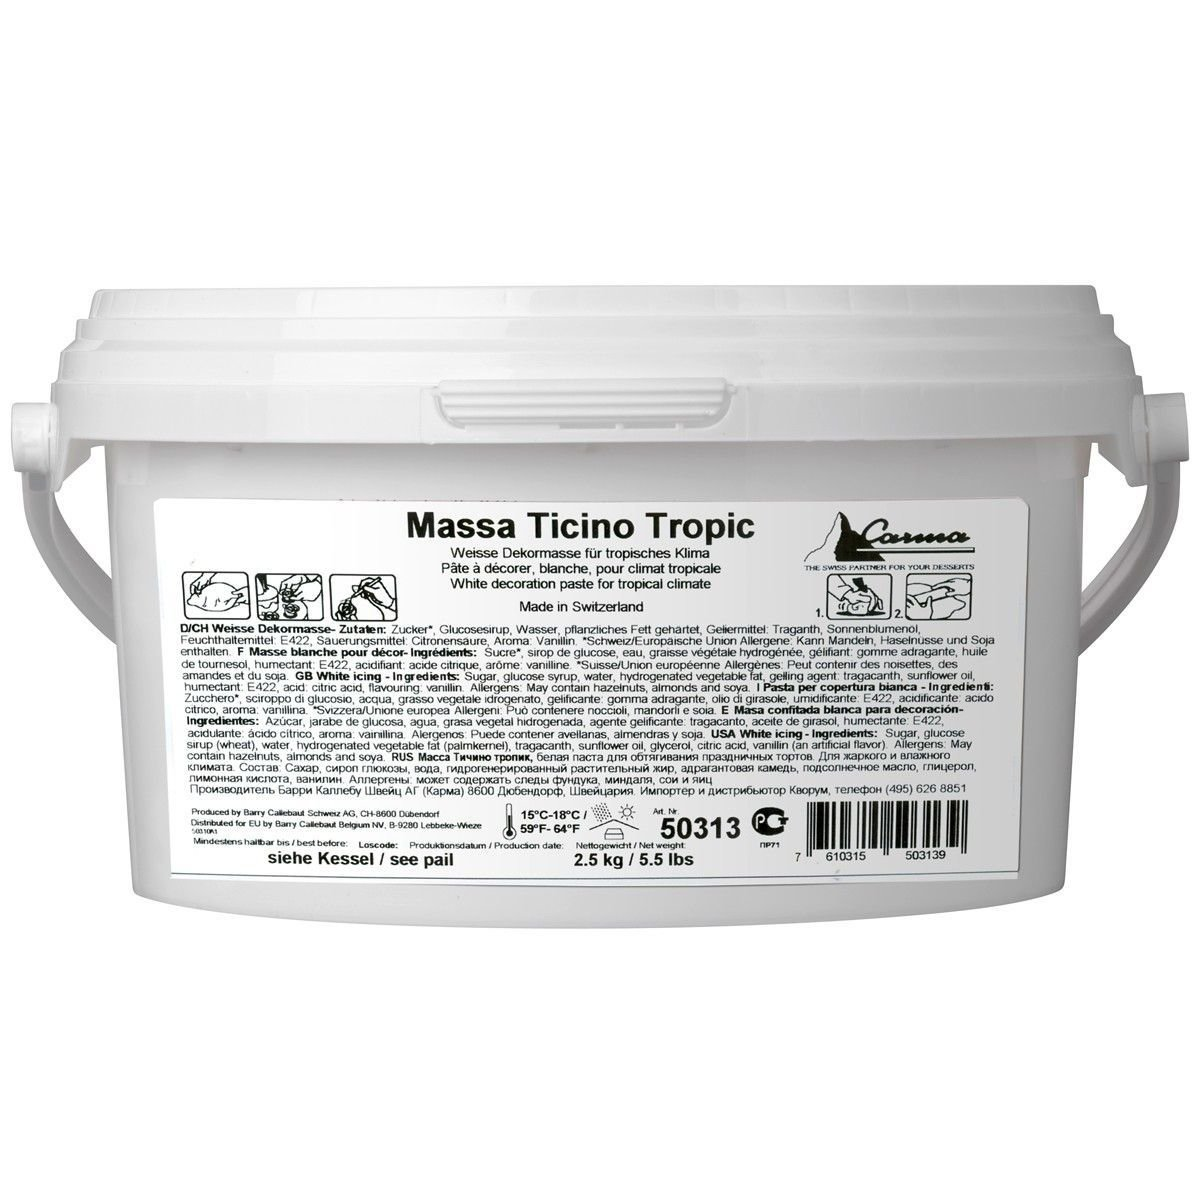 Carma - Massa Ticino Tropic Sugarpaste 2,5kg - Ζαχαρόπαστα Massa Ticino 2,5k